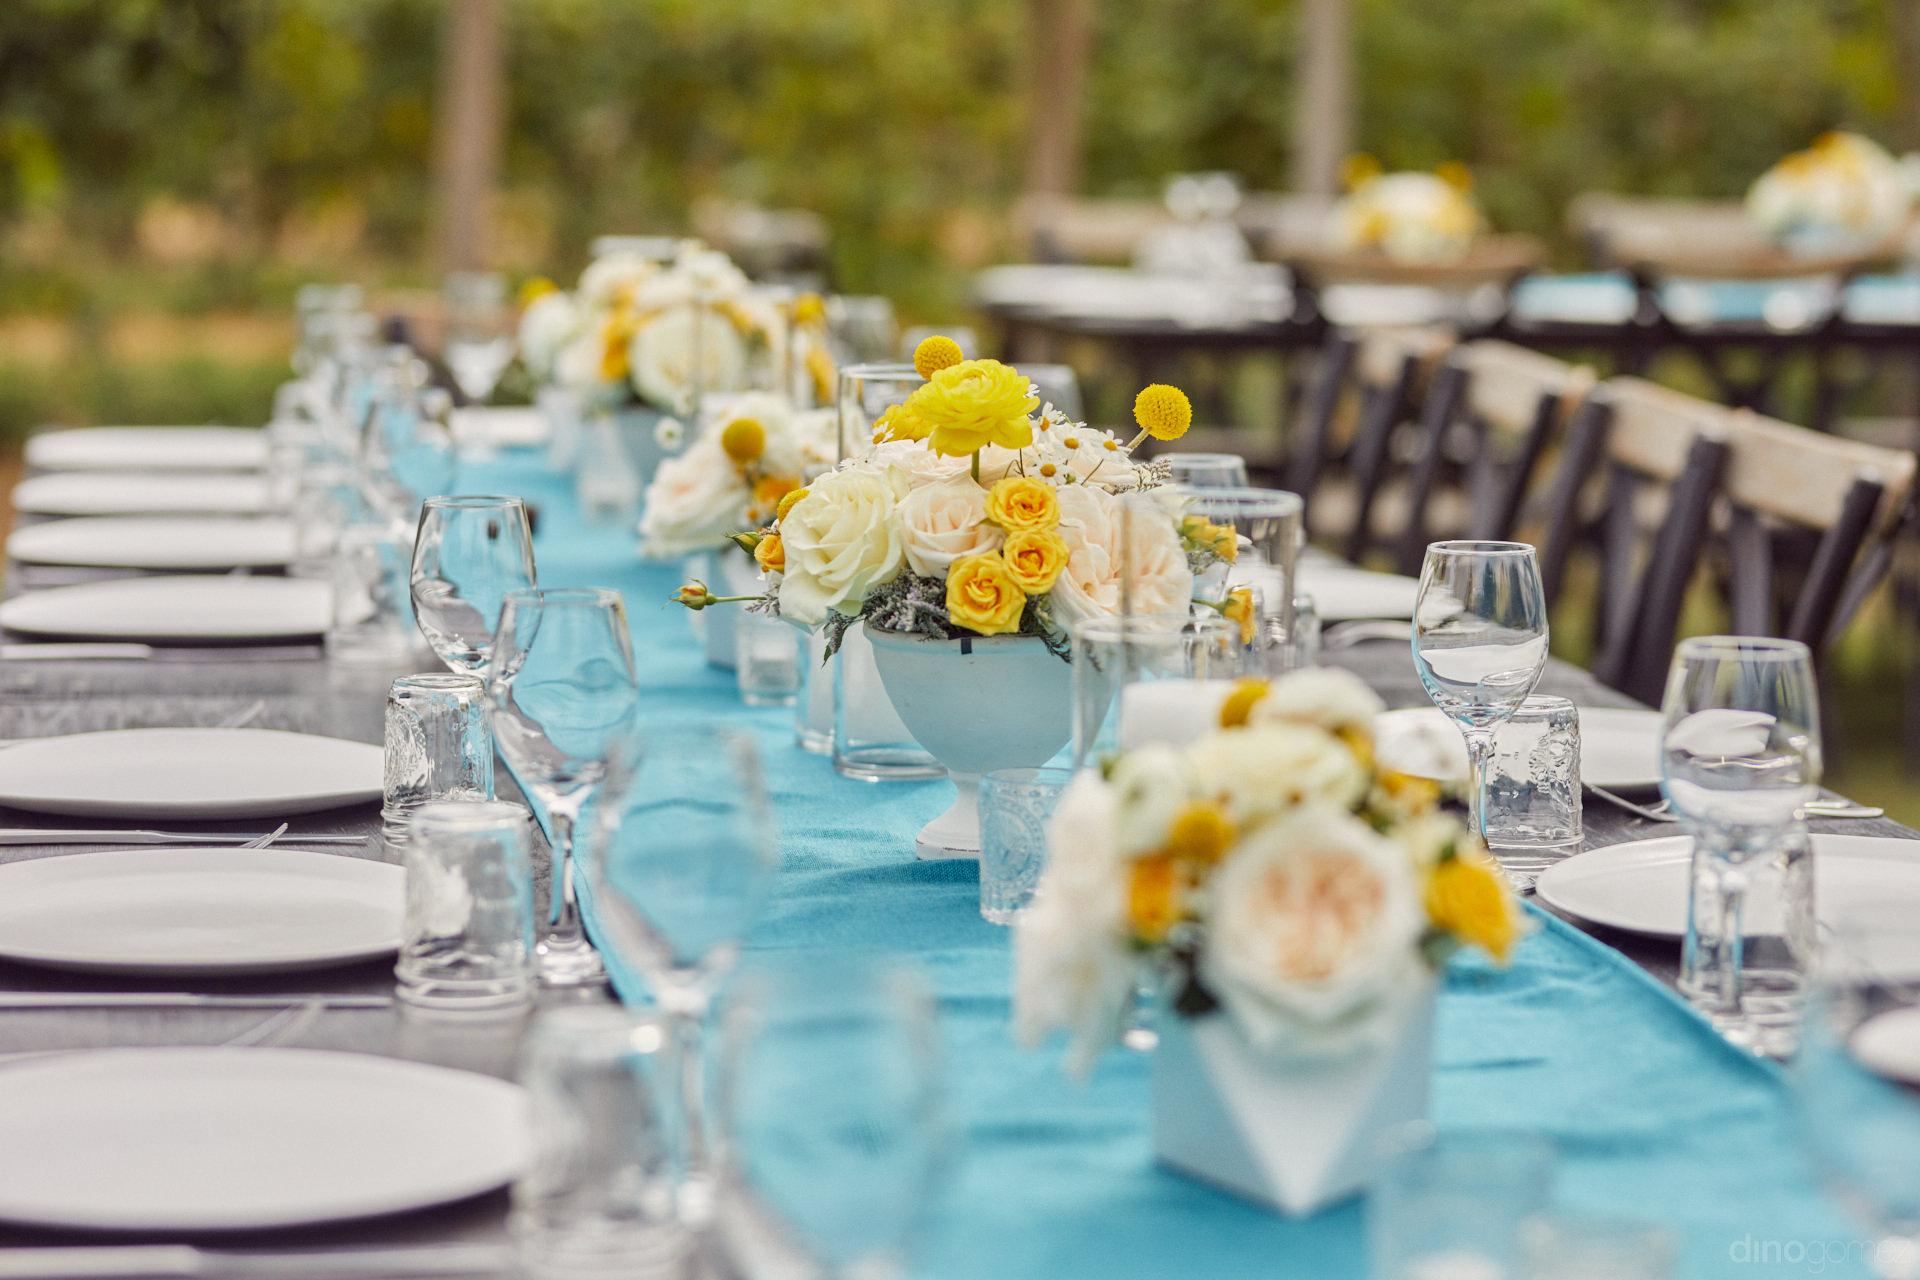 Expert Wedding Decor Companies In Los Cabos - Hilary & Bryan Flora Wedding